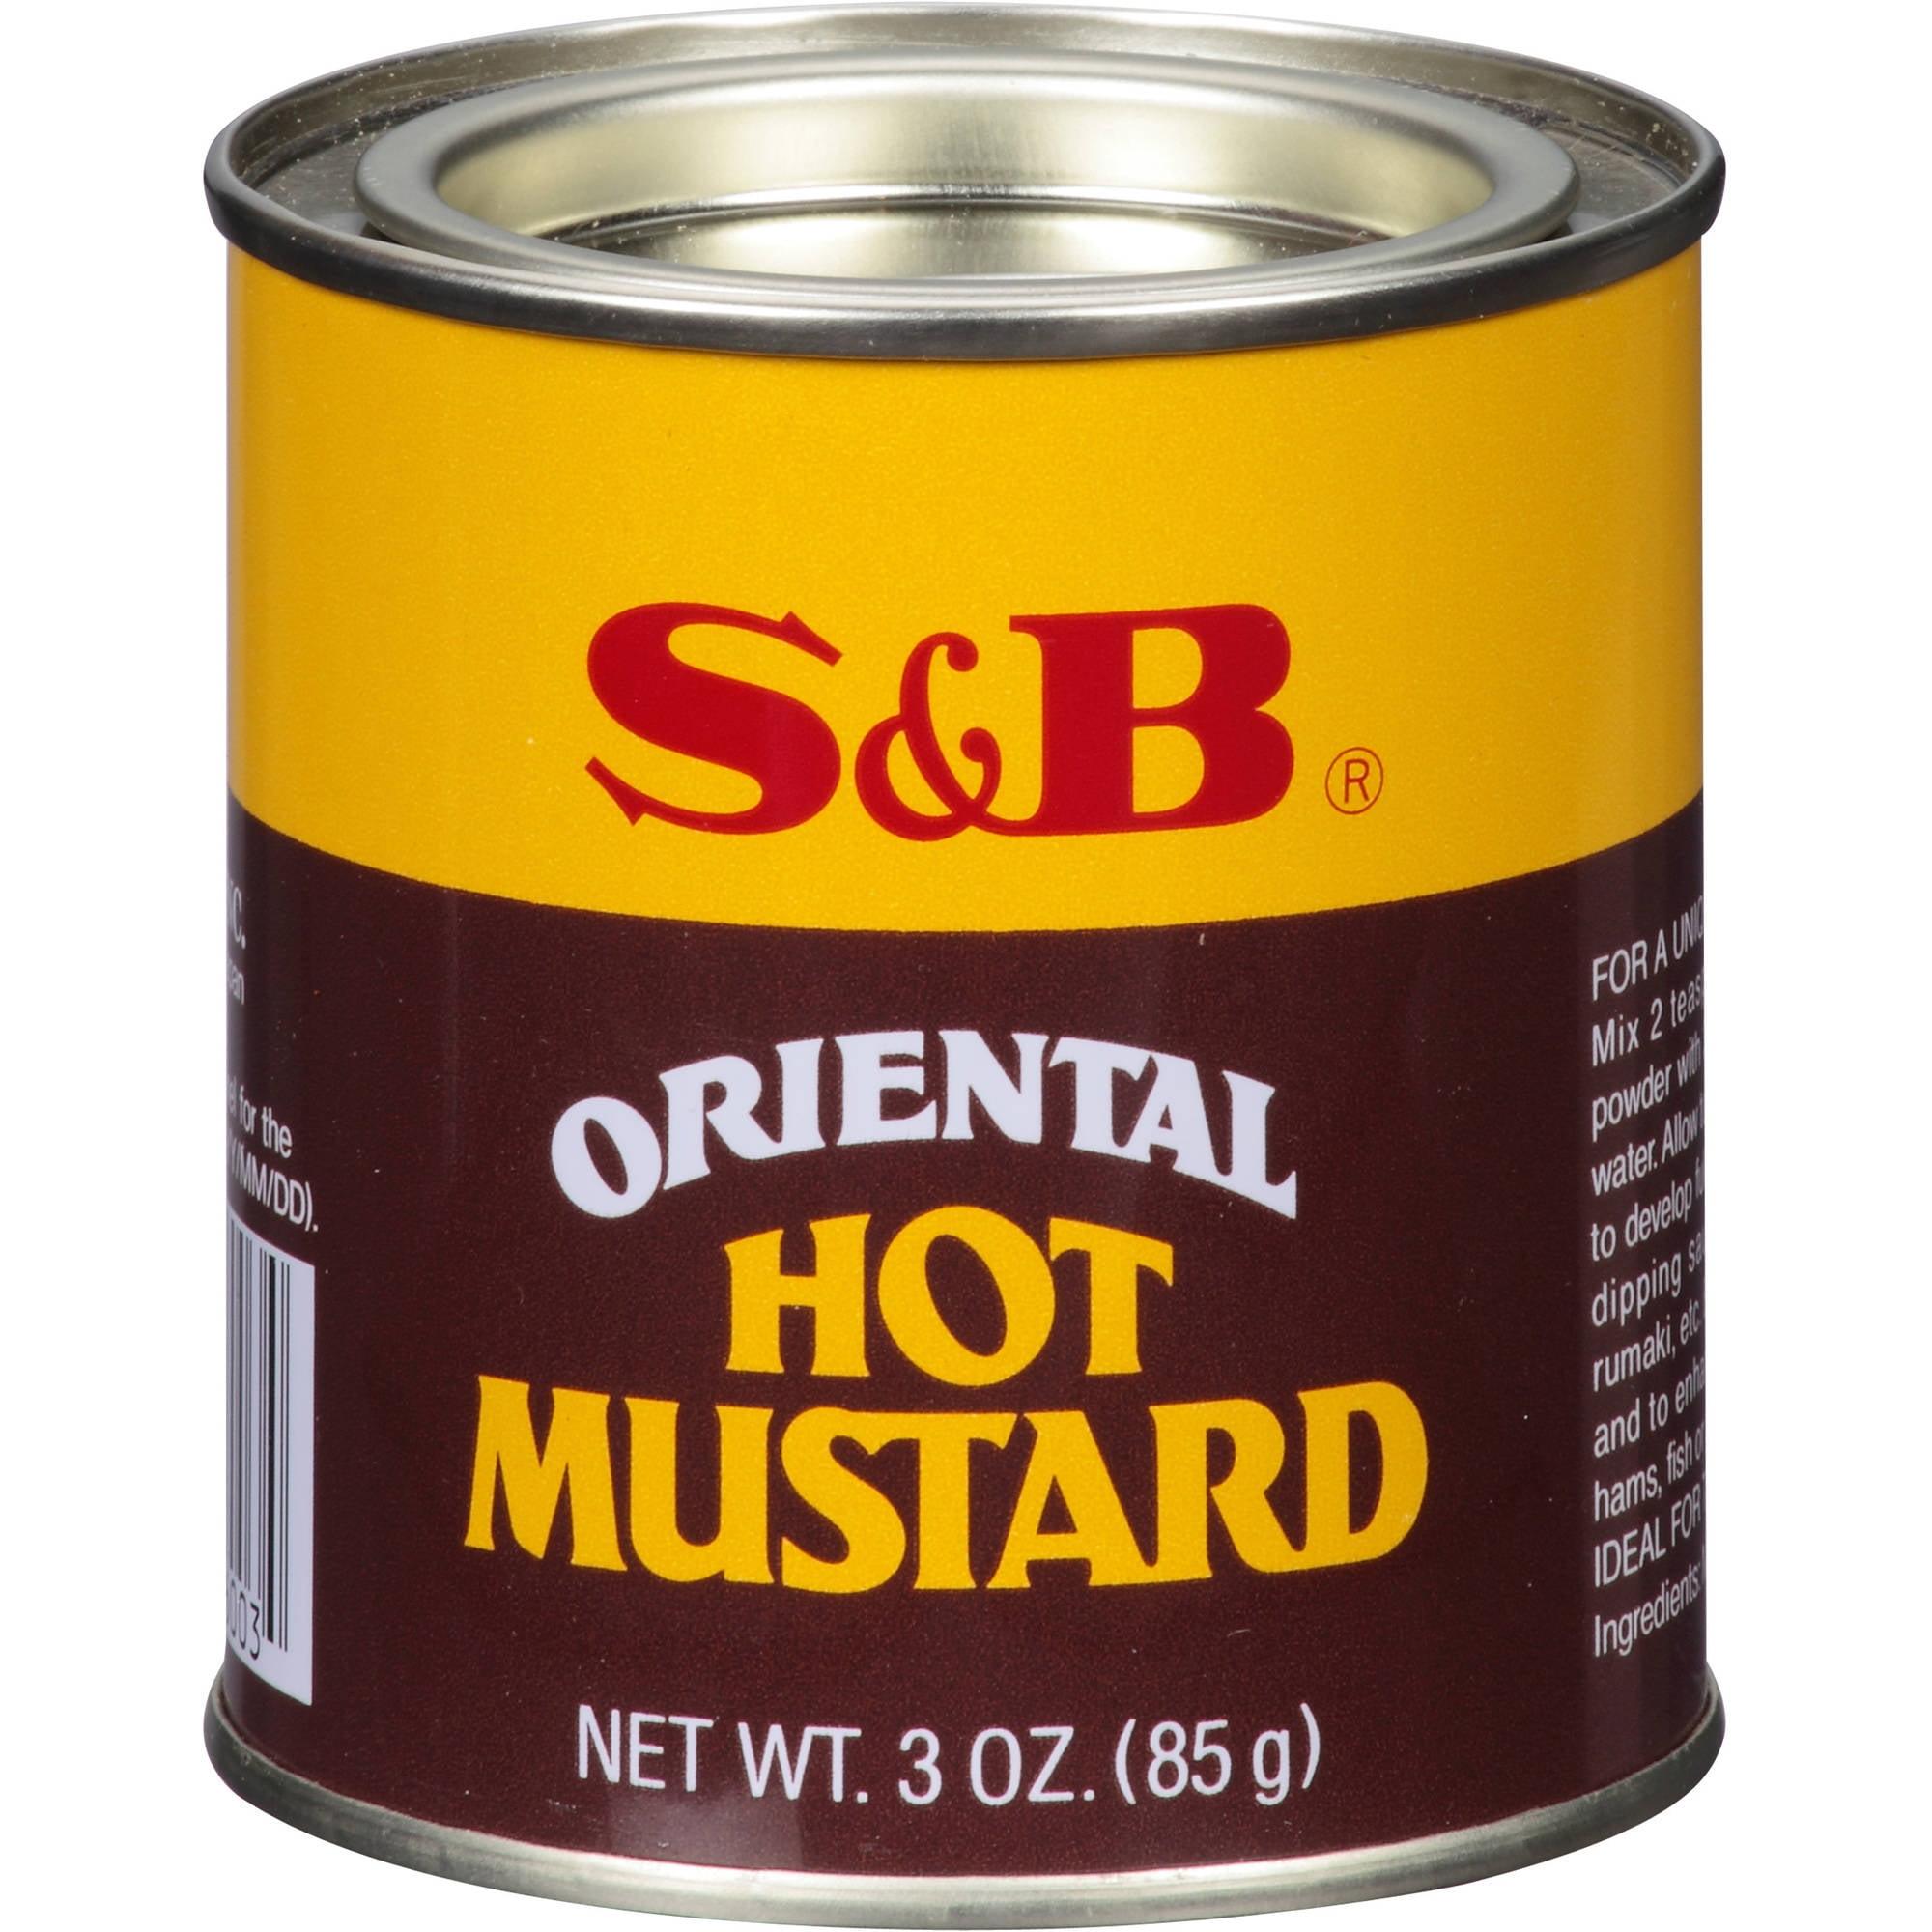 S&B Oriental Hot Mustard, 3 oz, (Pack of 12)